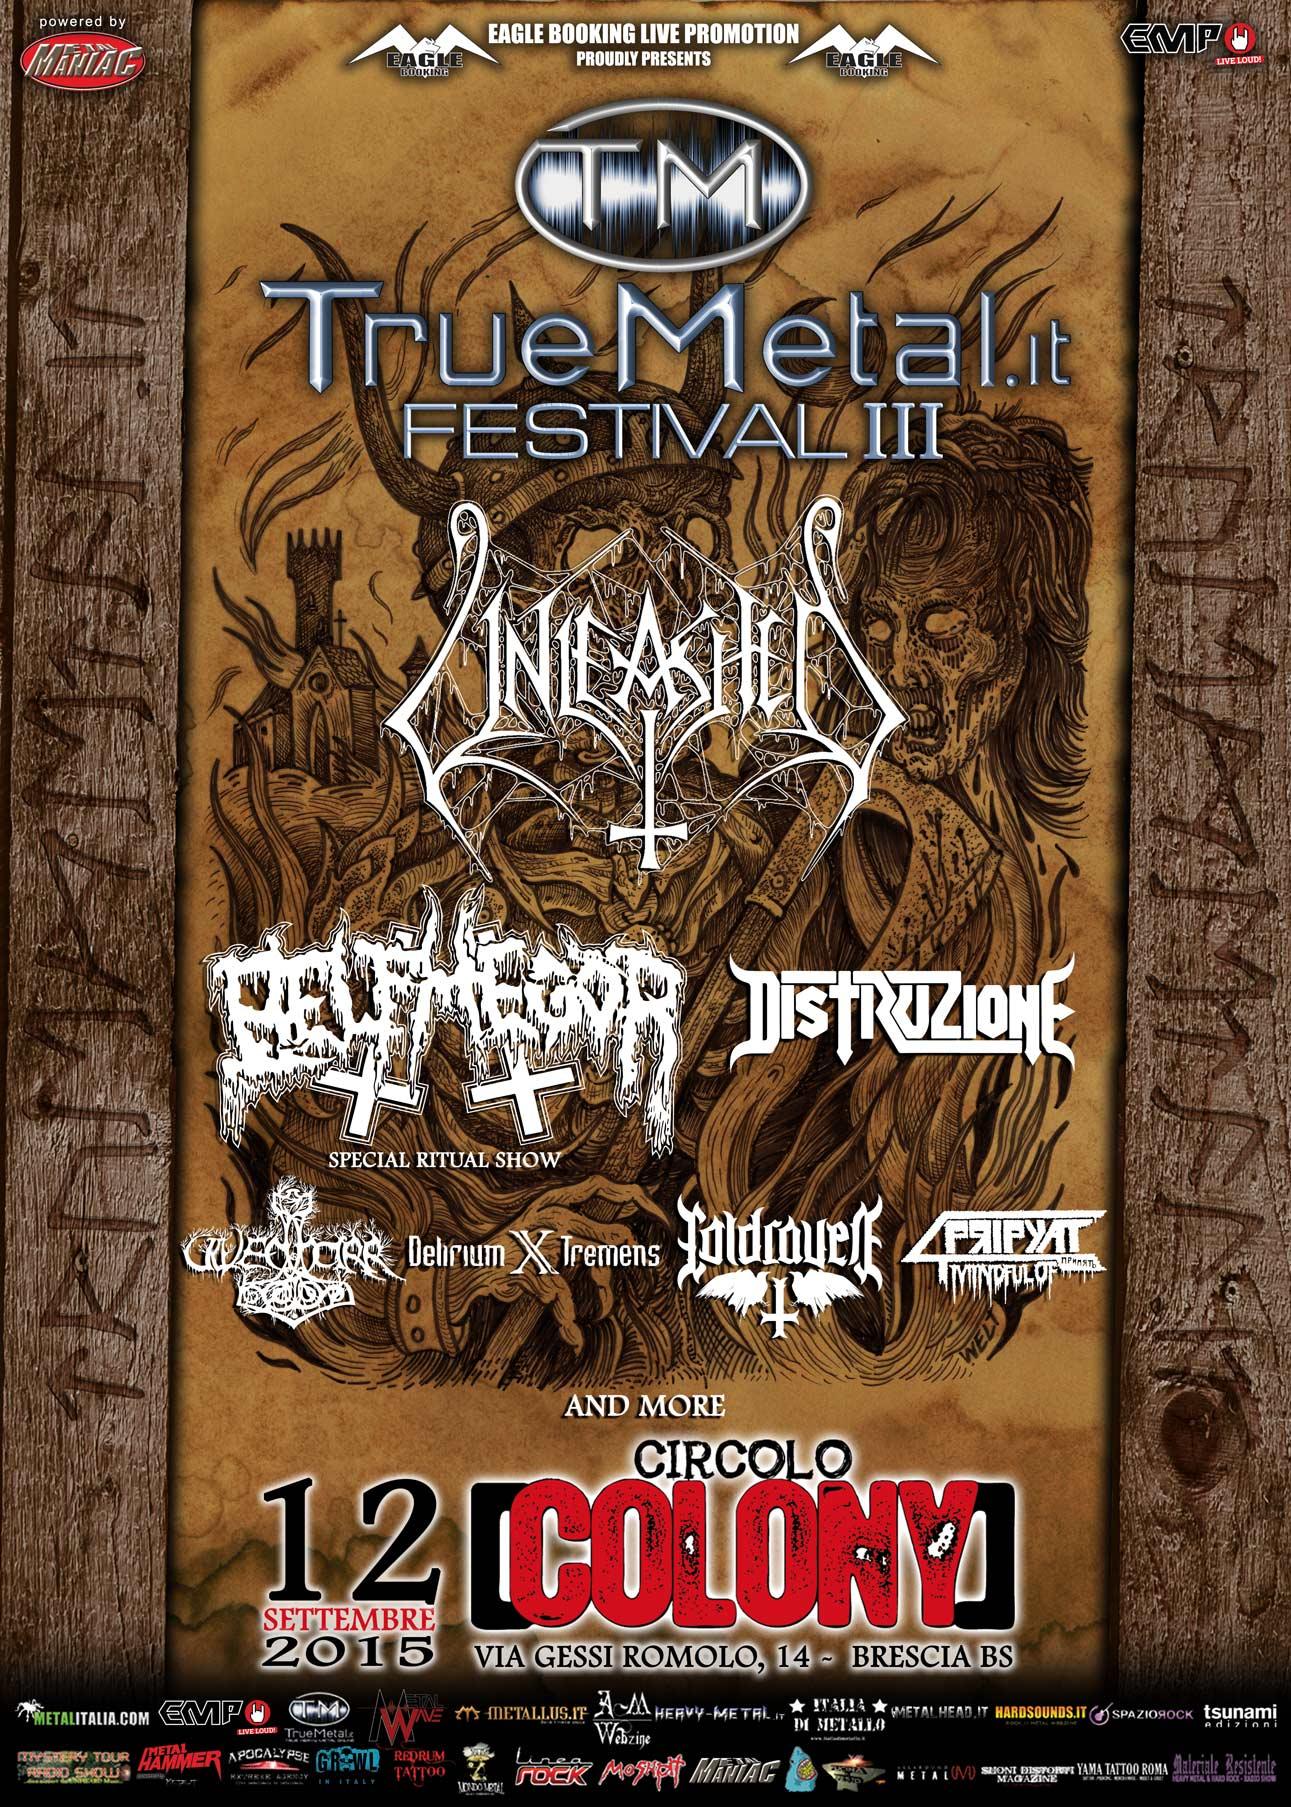 Truemetal Festival 2015 - Line Up Definitiva